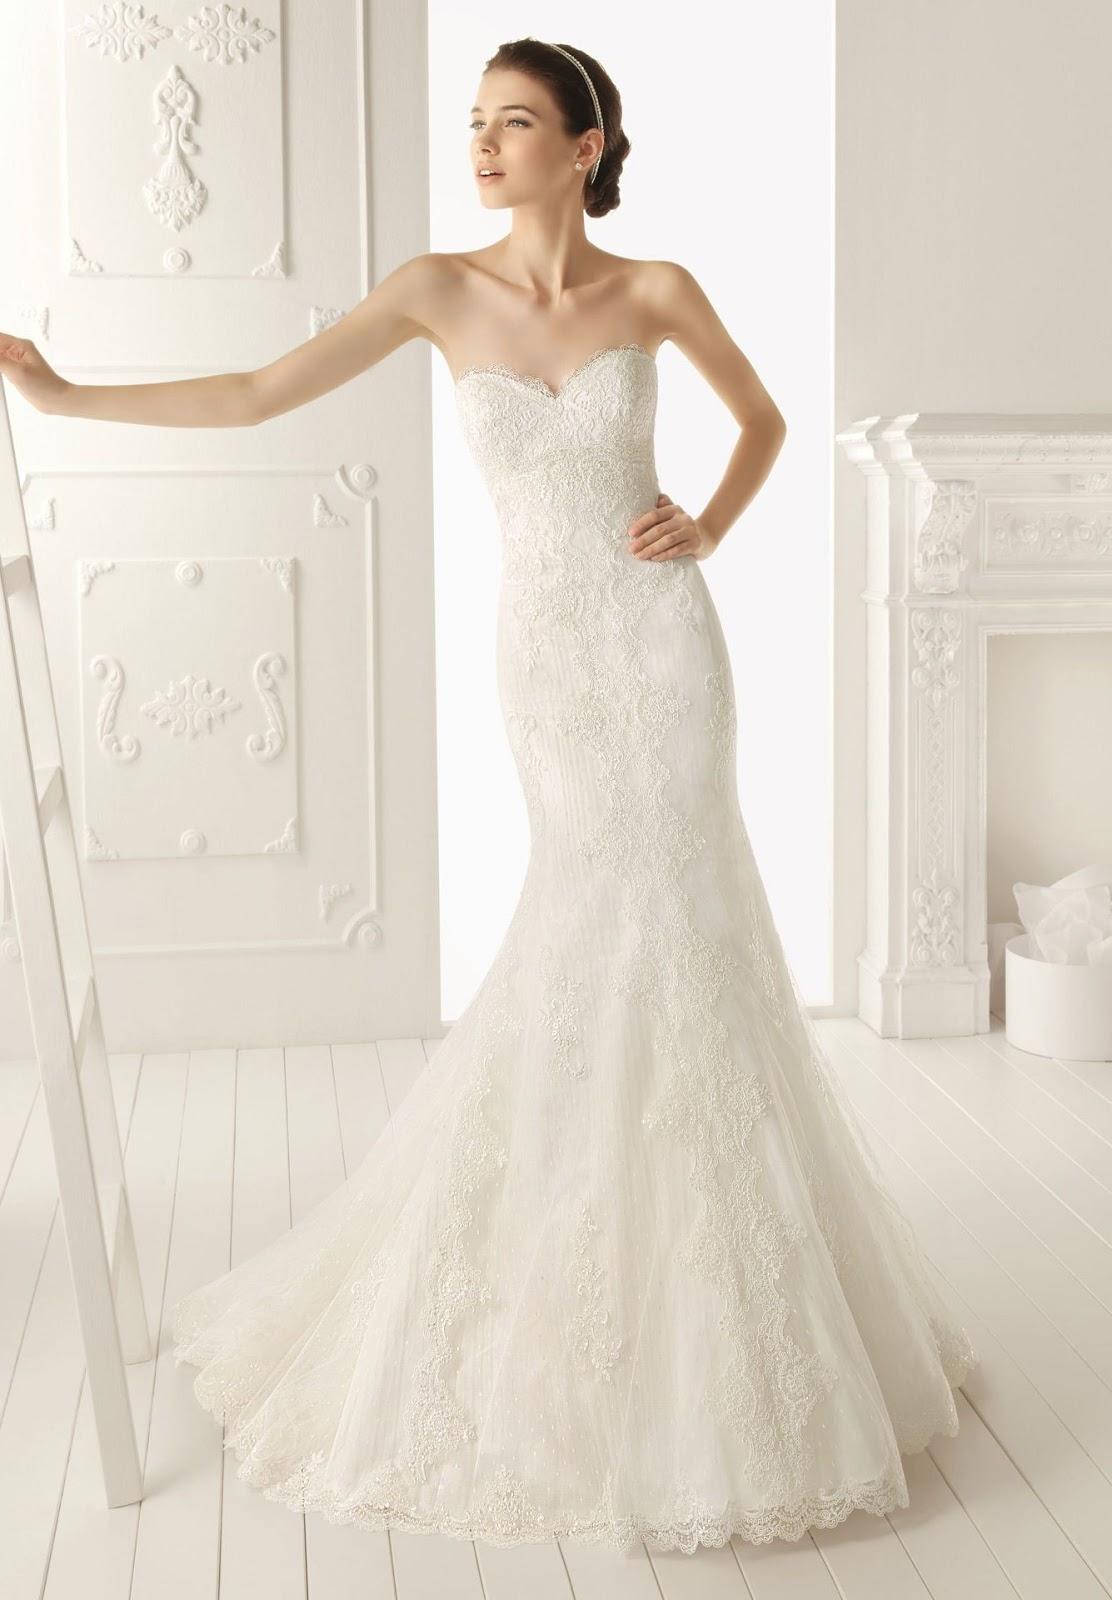 Lace Wedding Dresses Simple and Elegant